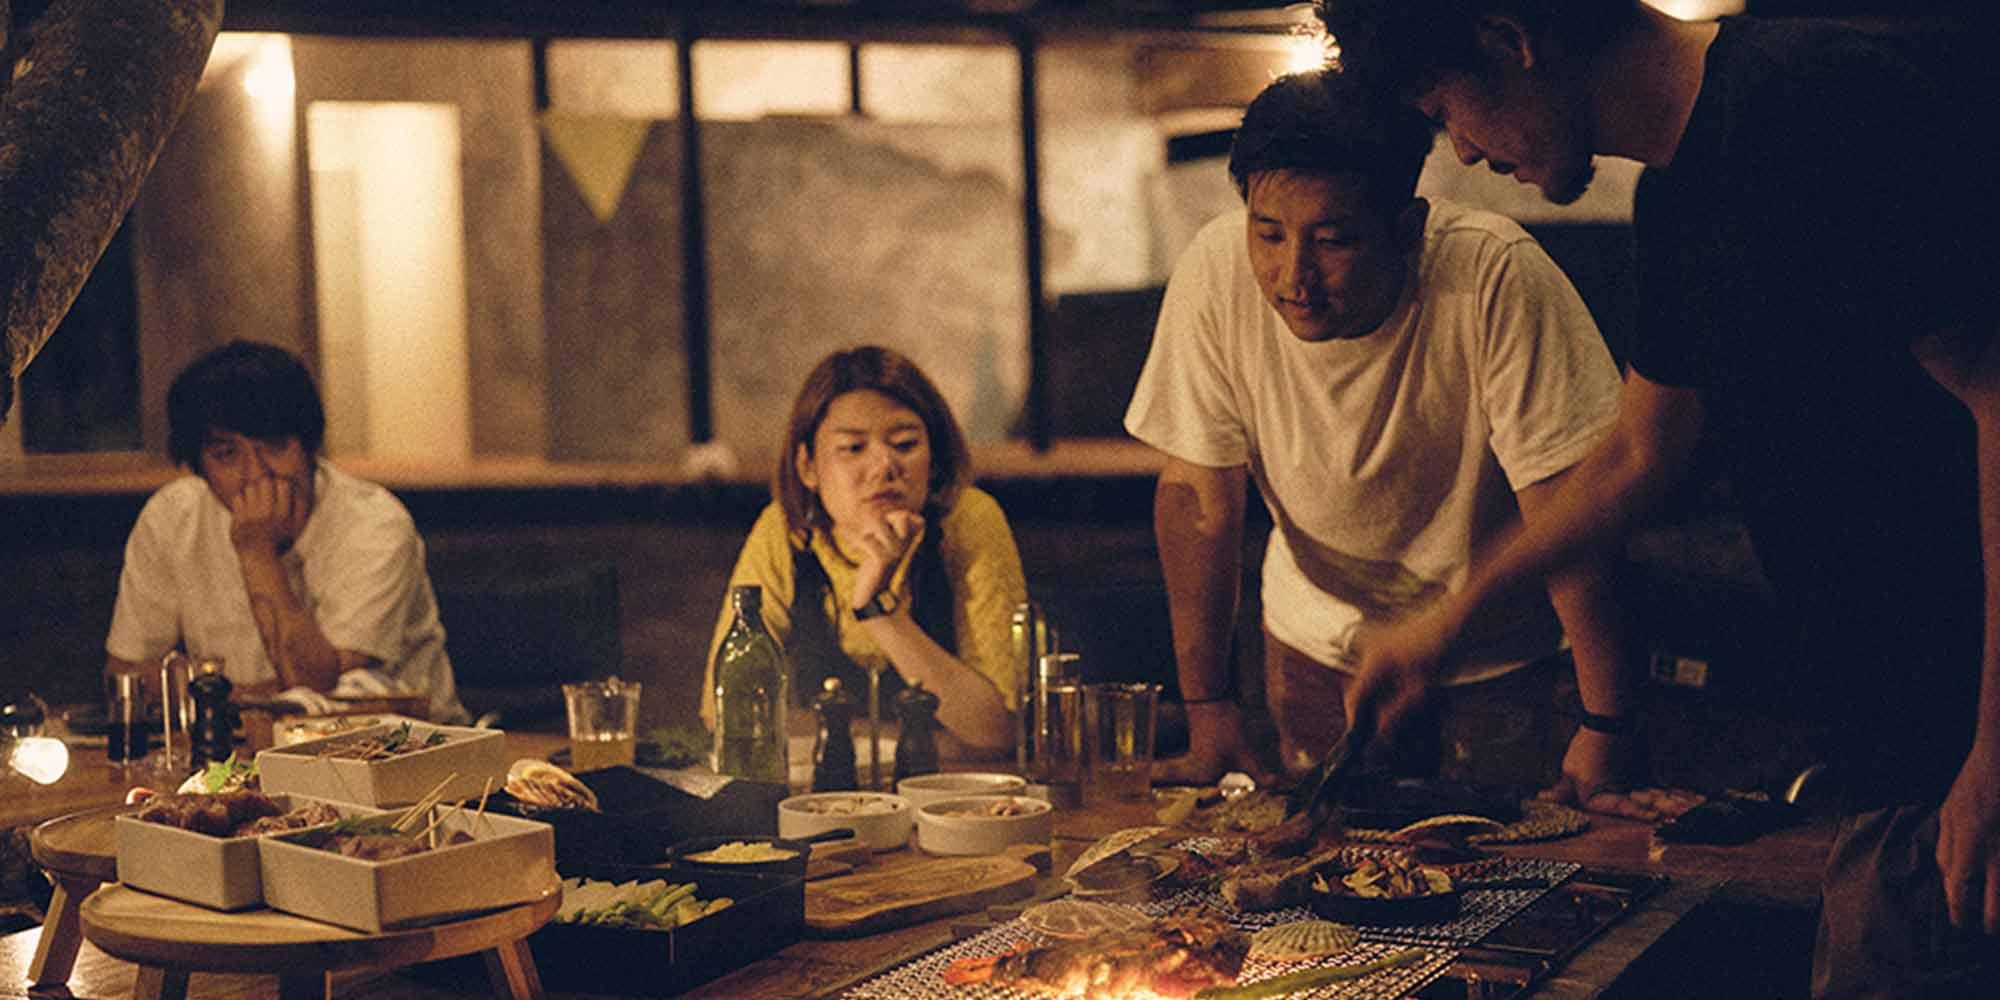 LOOF TINY HOUSE CAMP るうふ/BBQ イメージ写真1